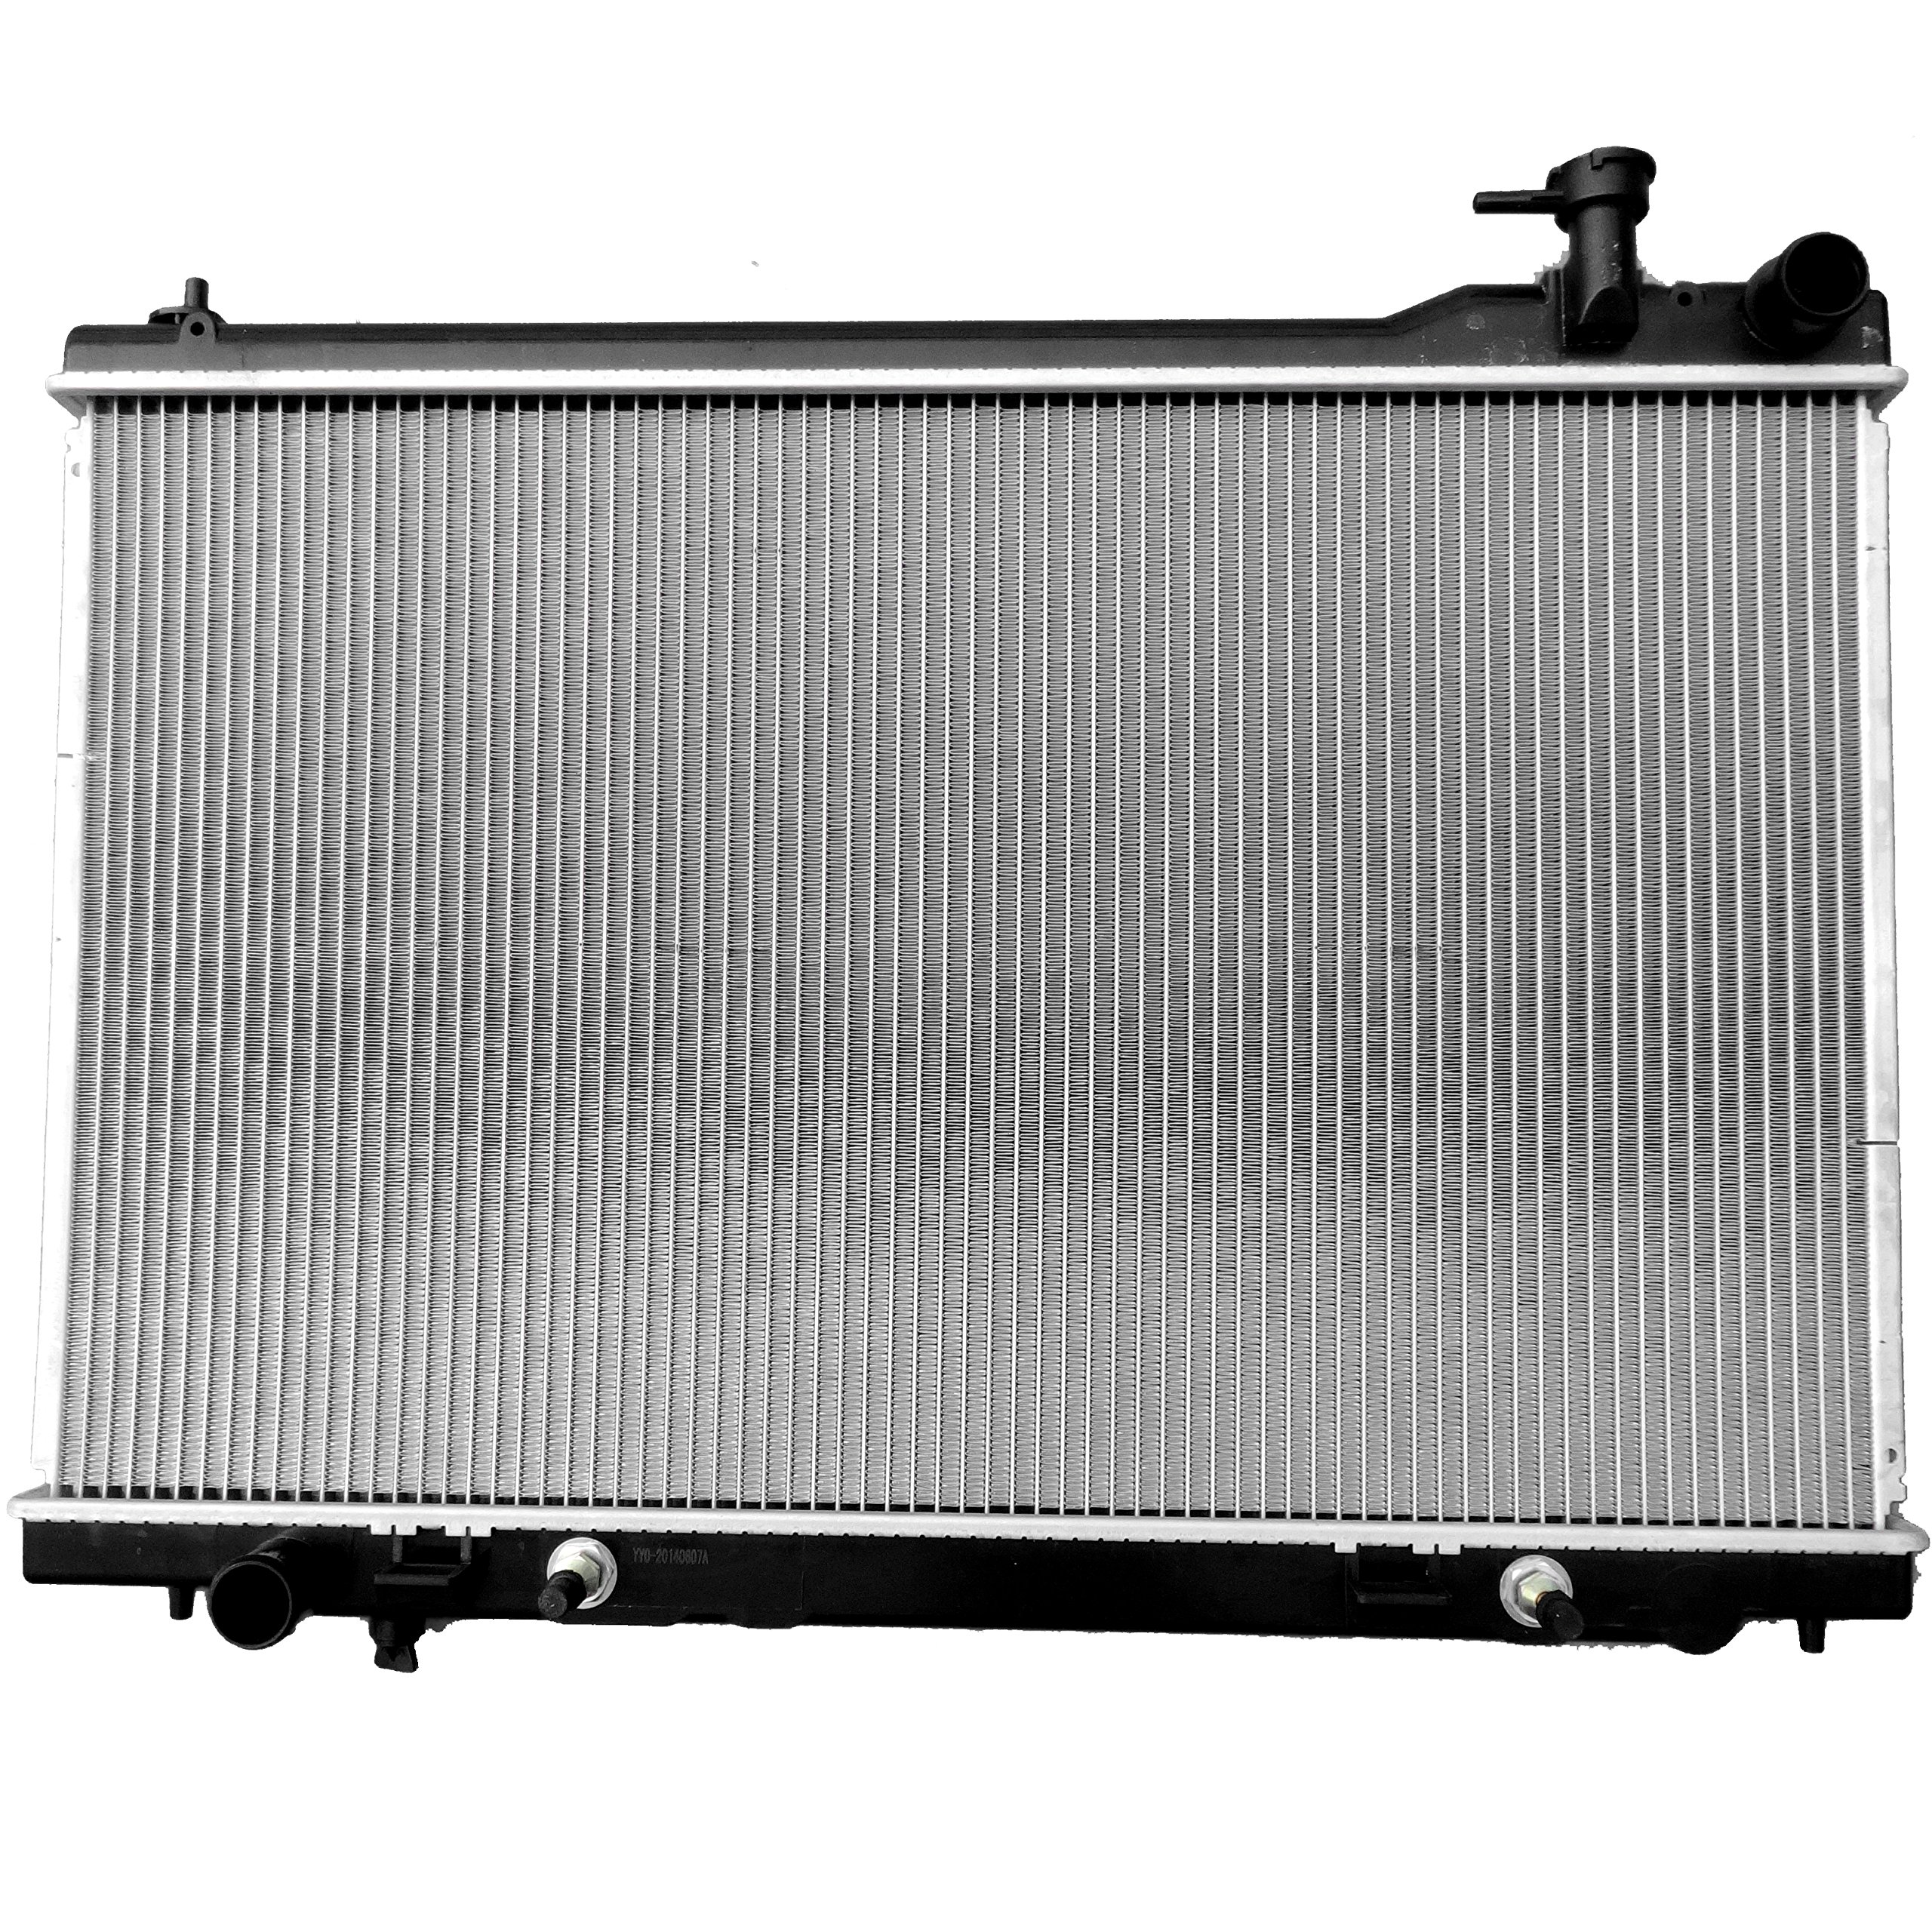 ECCPP Radiator 2683 for Infiniti FX35 Base Sport Utility 4-Door 3.5L 3498CC V6 GAS DOHC Naturally Aspirated